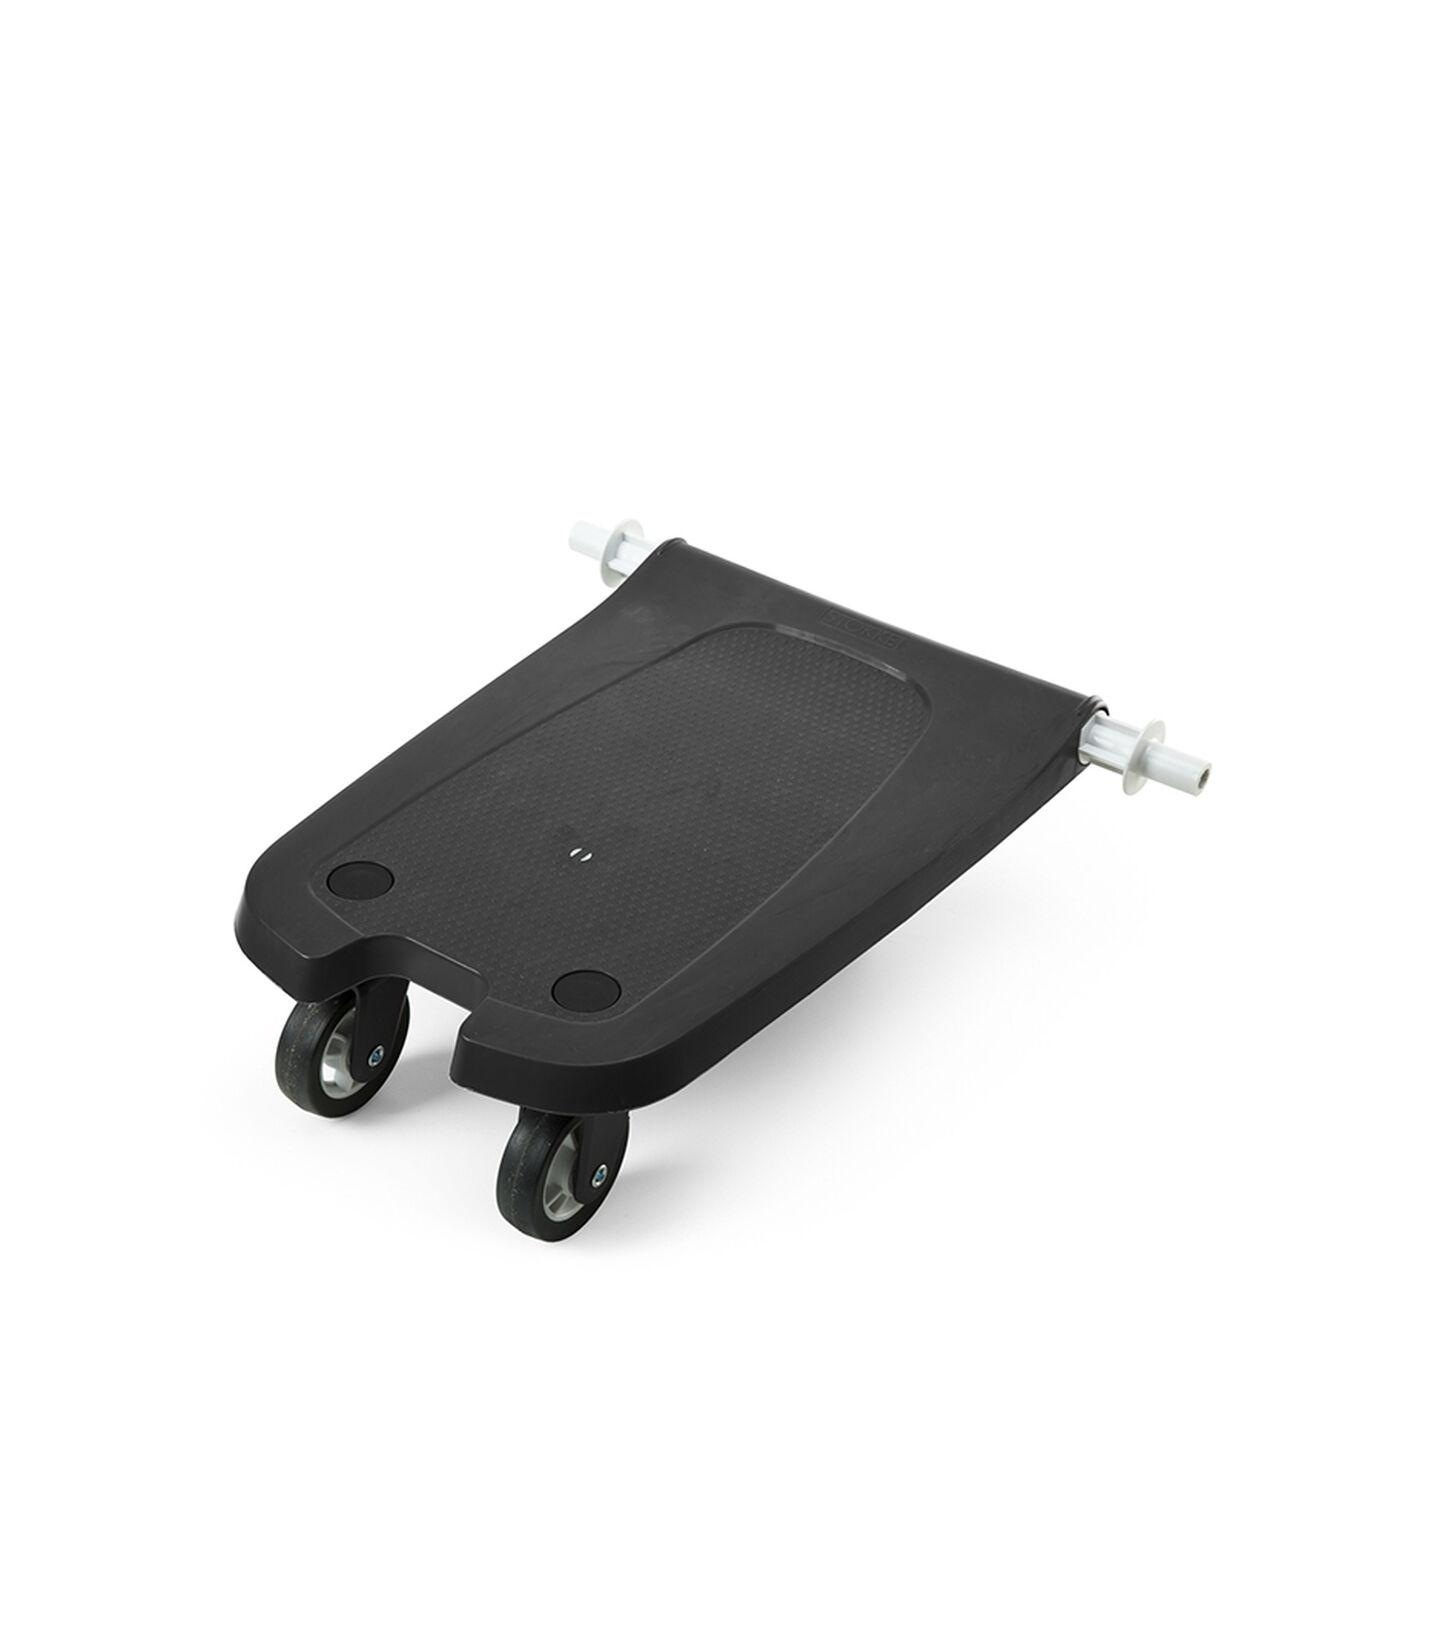 Stokke® Xplory® Sibling Board Black. Accessories. view 2